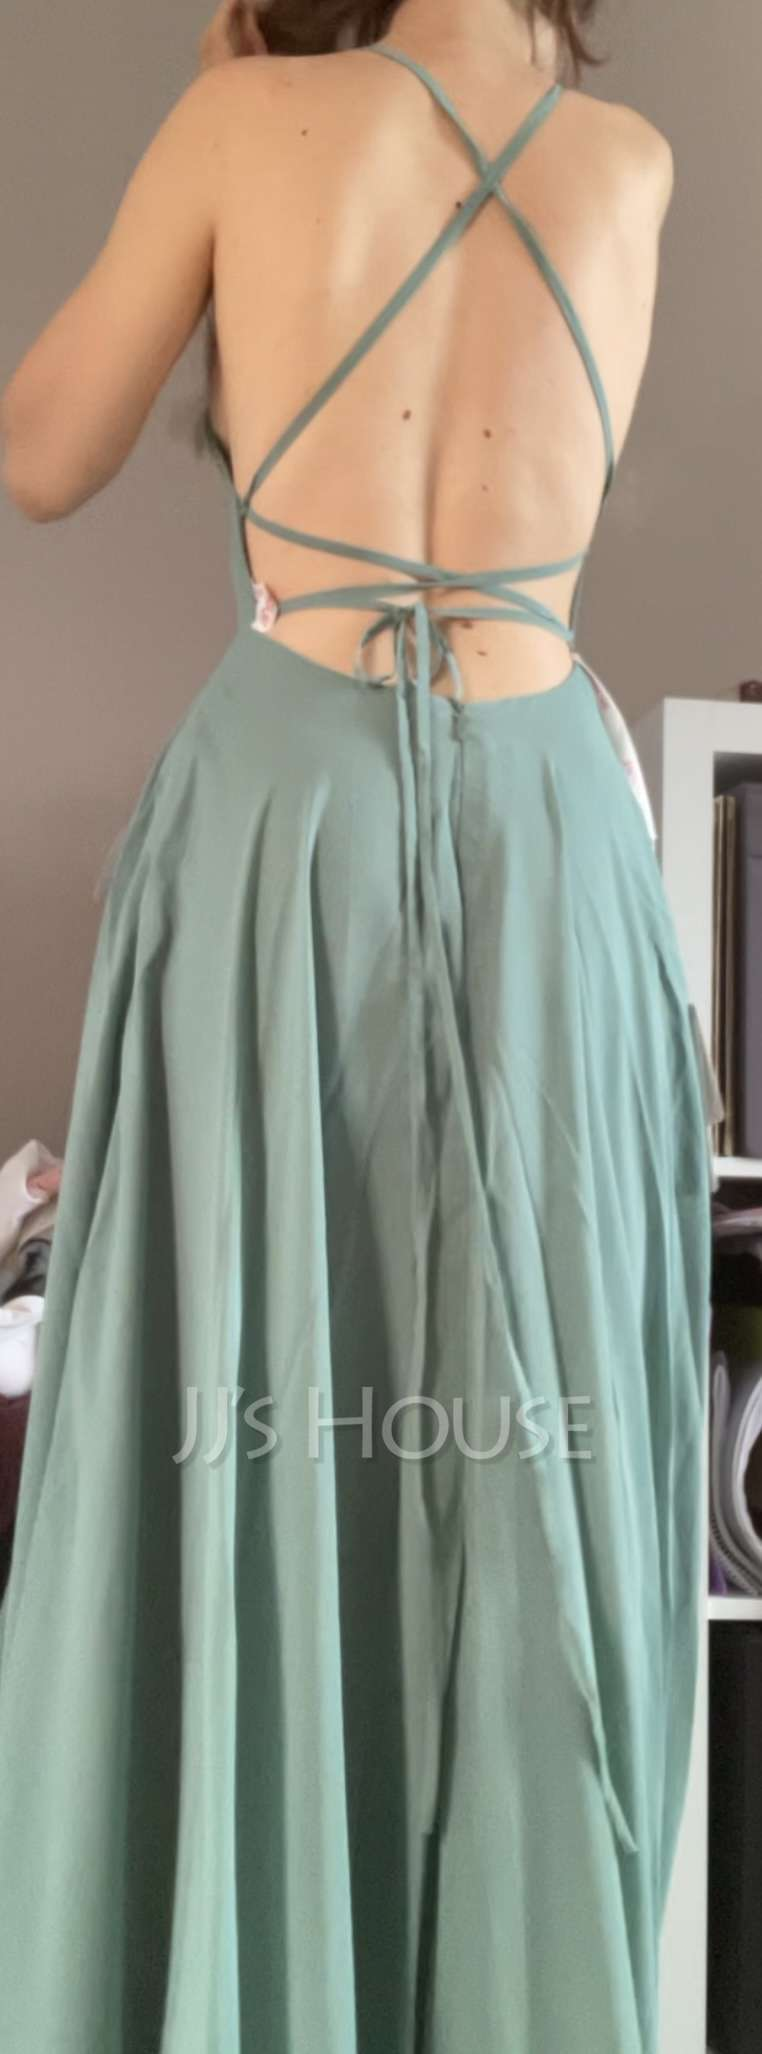 A-Line Square Neckline Floor-Length Chiffon Bridesmaid Dress With Split Front Pockets